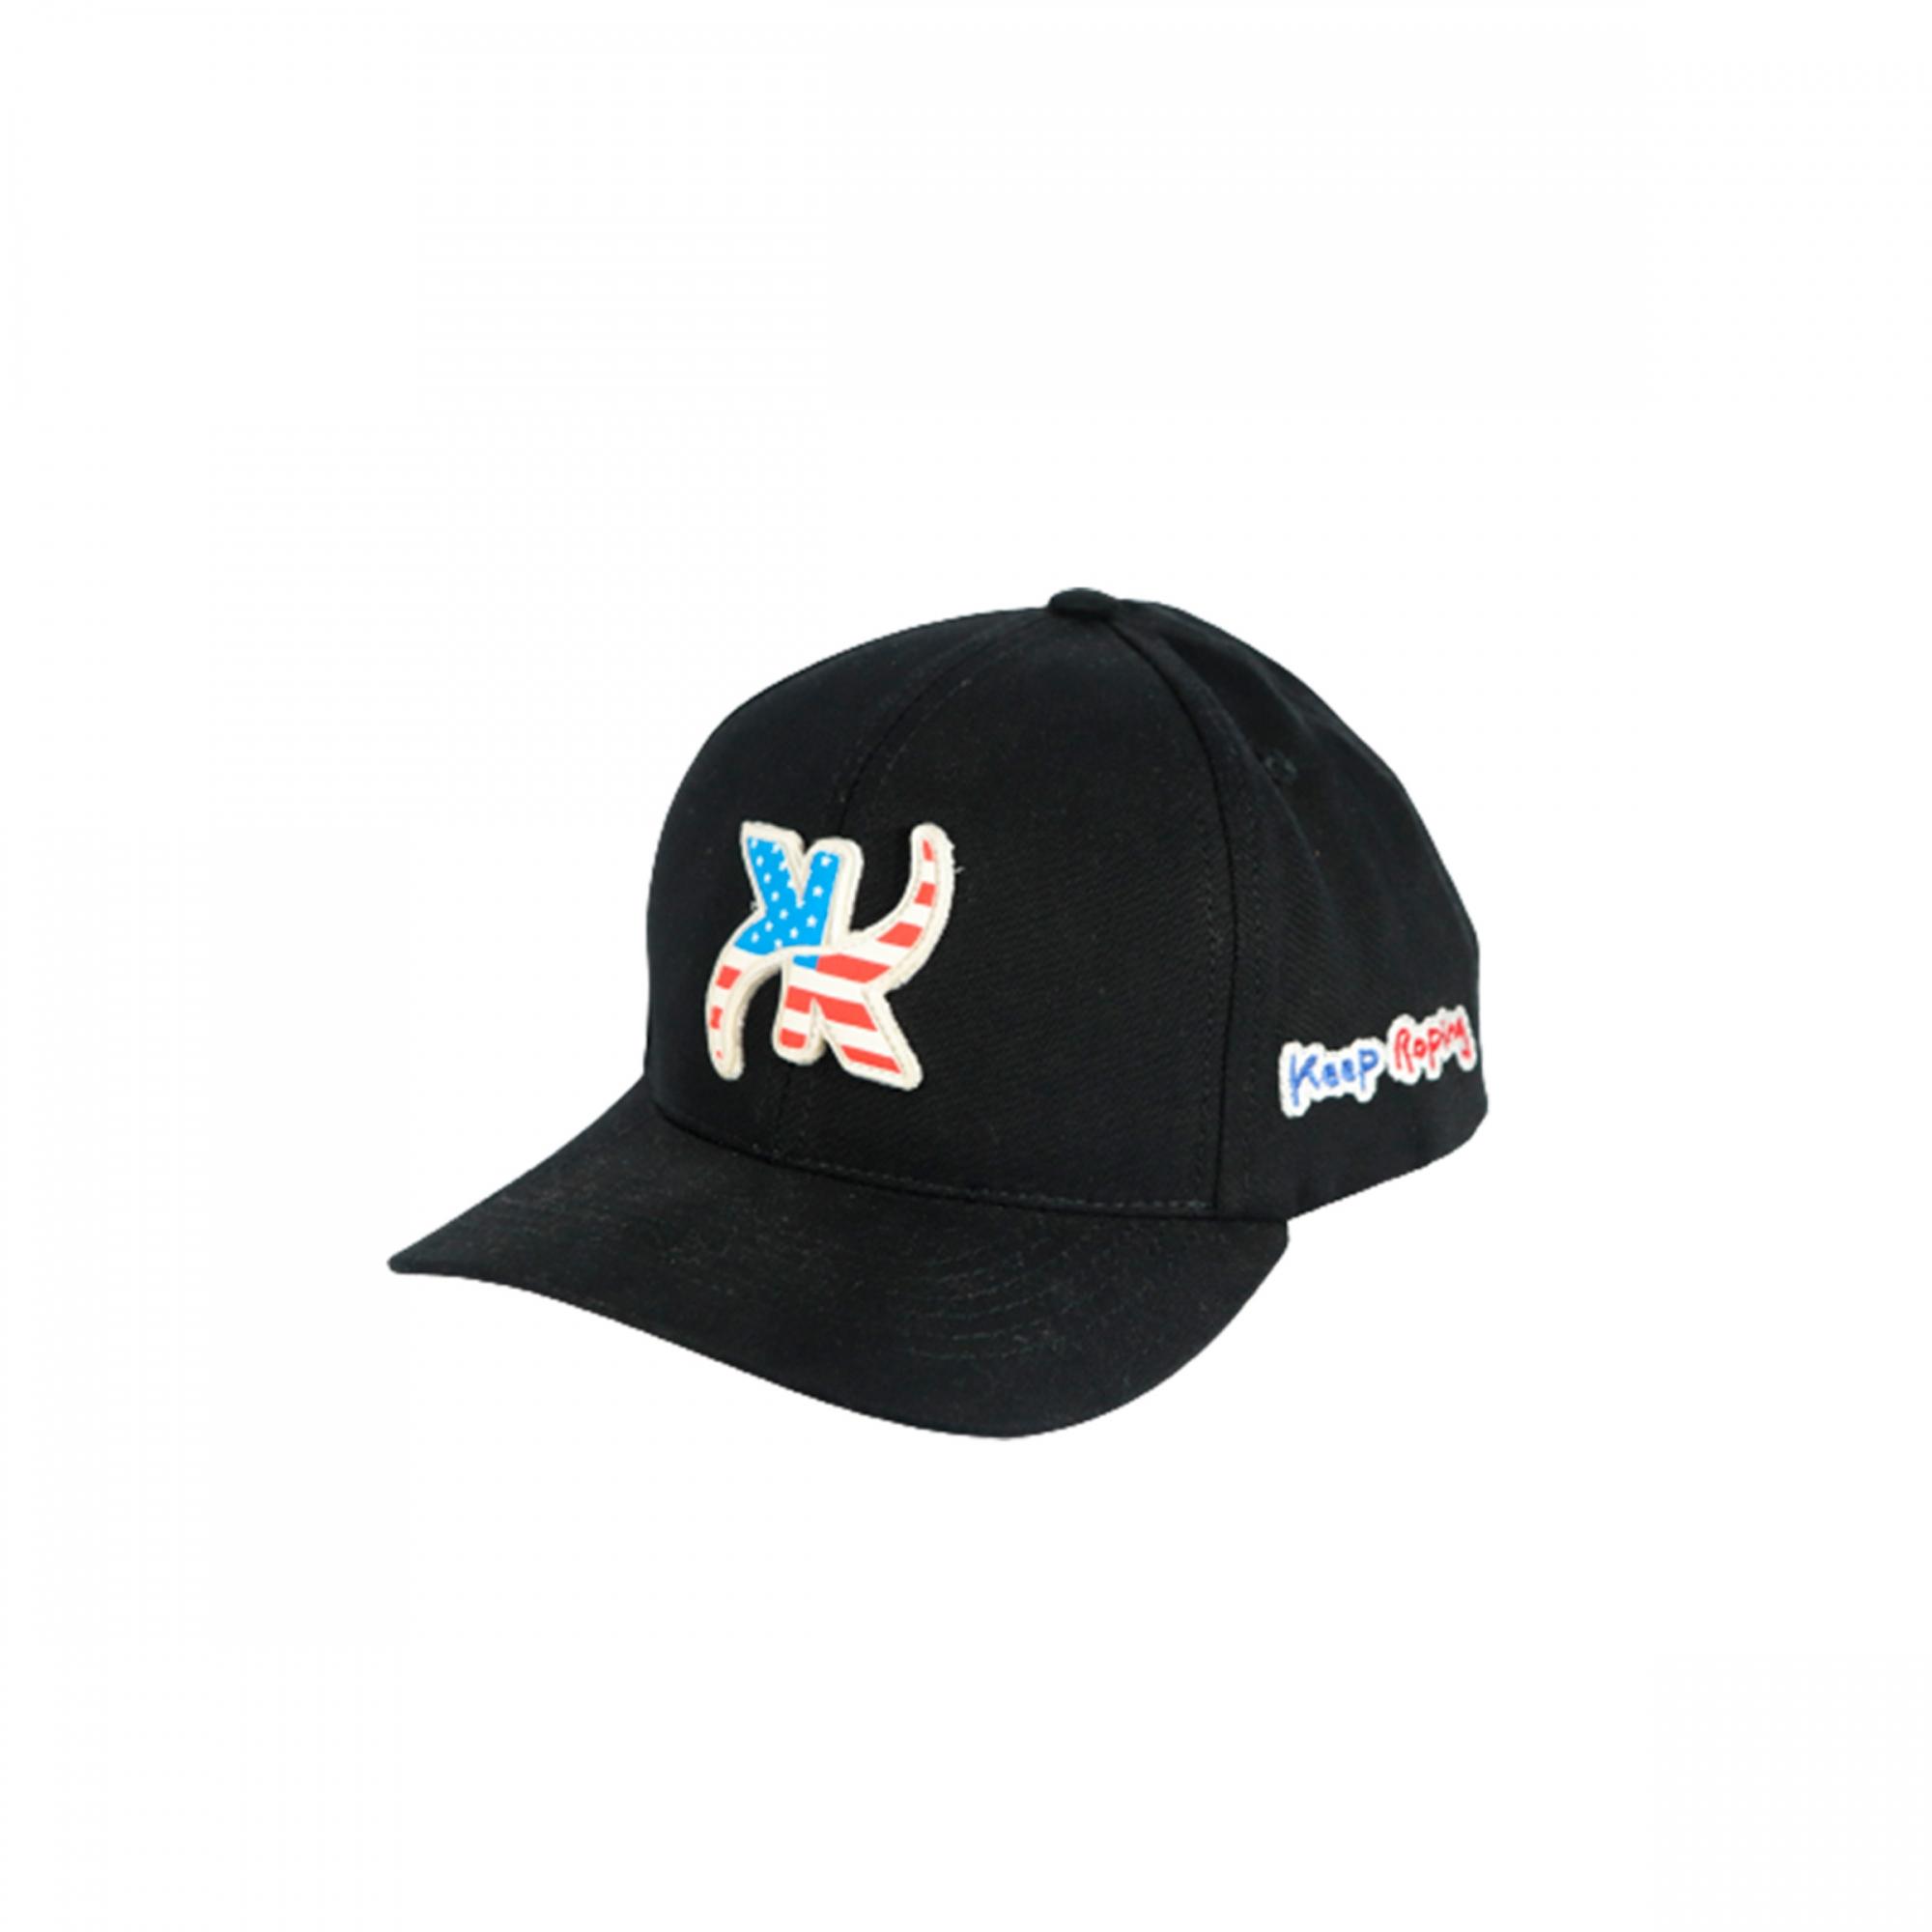 Boné Keep Roping Baseball Hat com aba curva Preto/USA